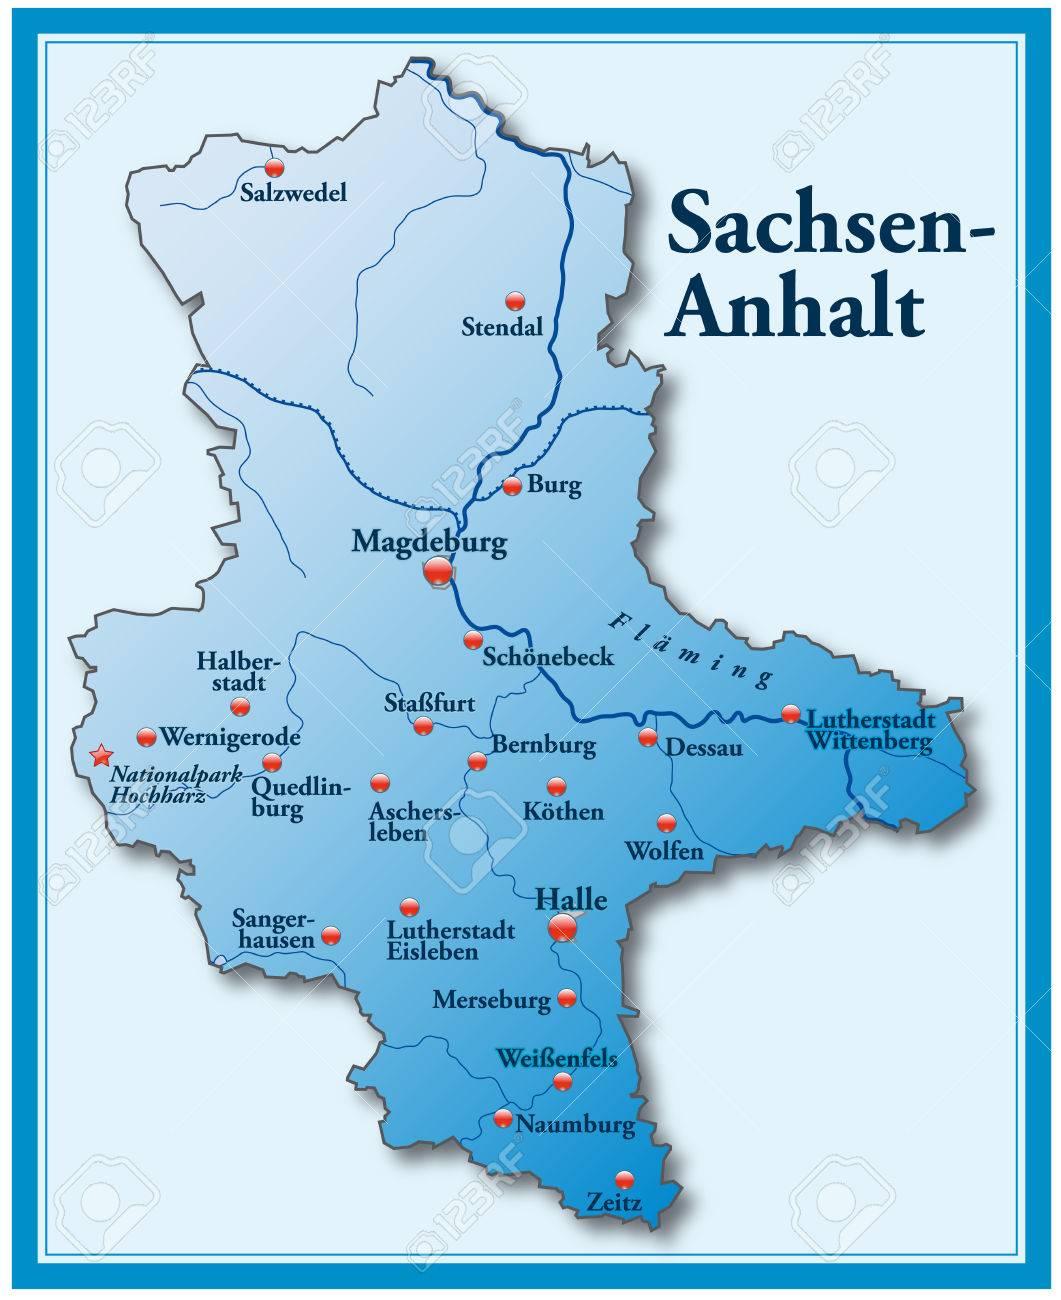 Karte Sachsen Anhalt.Stock Photo